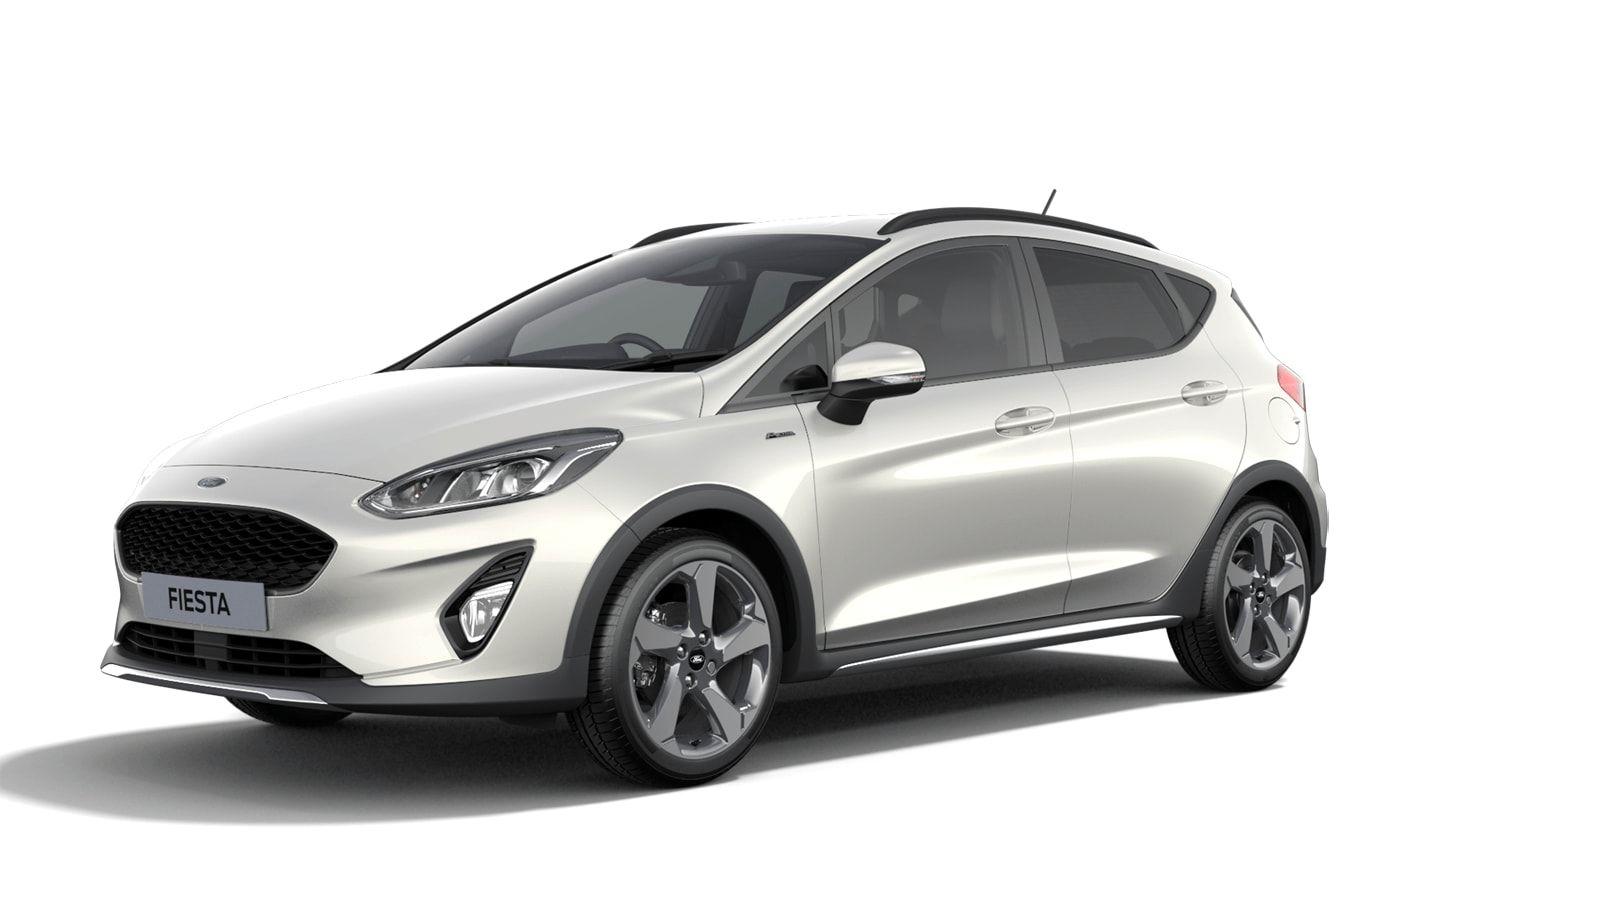 "Nieuw Ford All-new ford fiesta Active 1.0i EcoBoost mHEV 125ps / 92kW M6 - 5d JKV - Speciale metaalkleur ""Metropolis White"" 1"